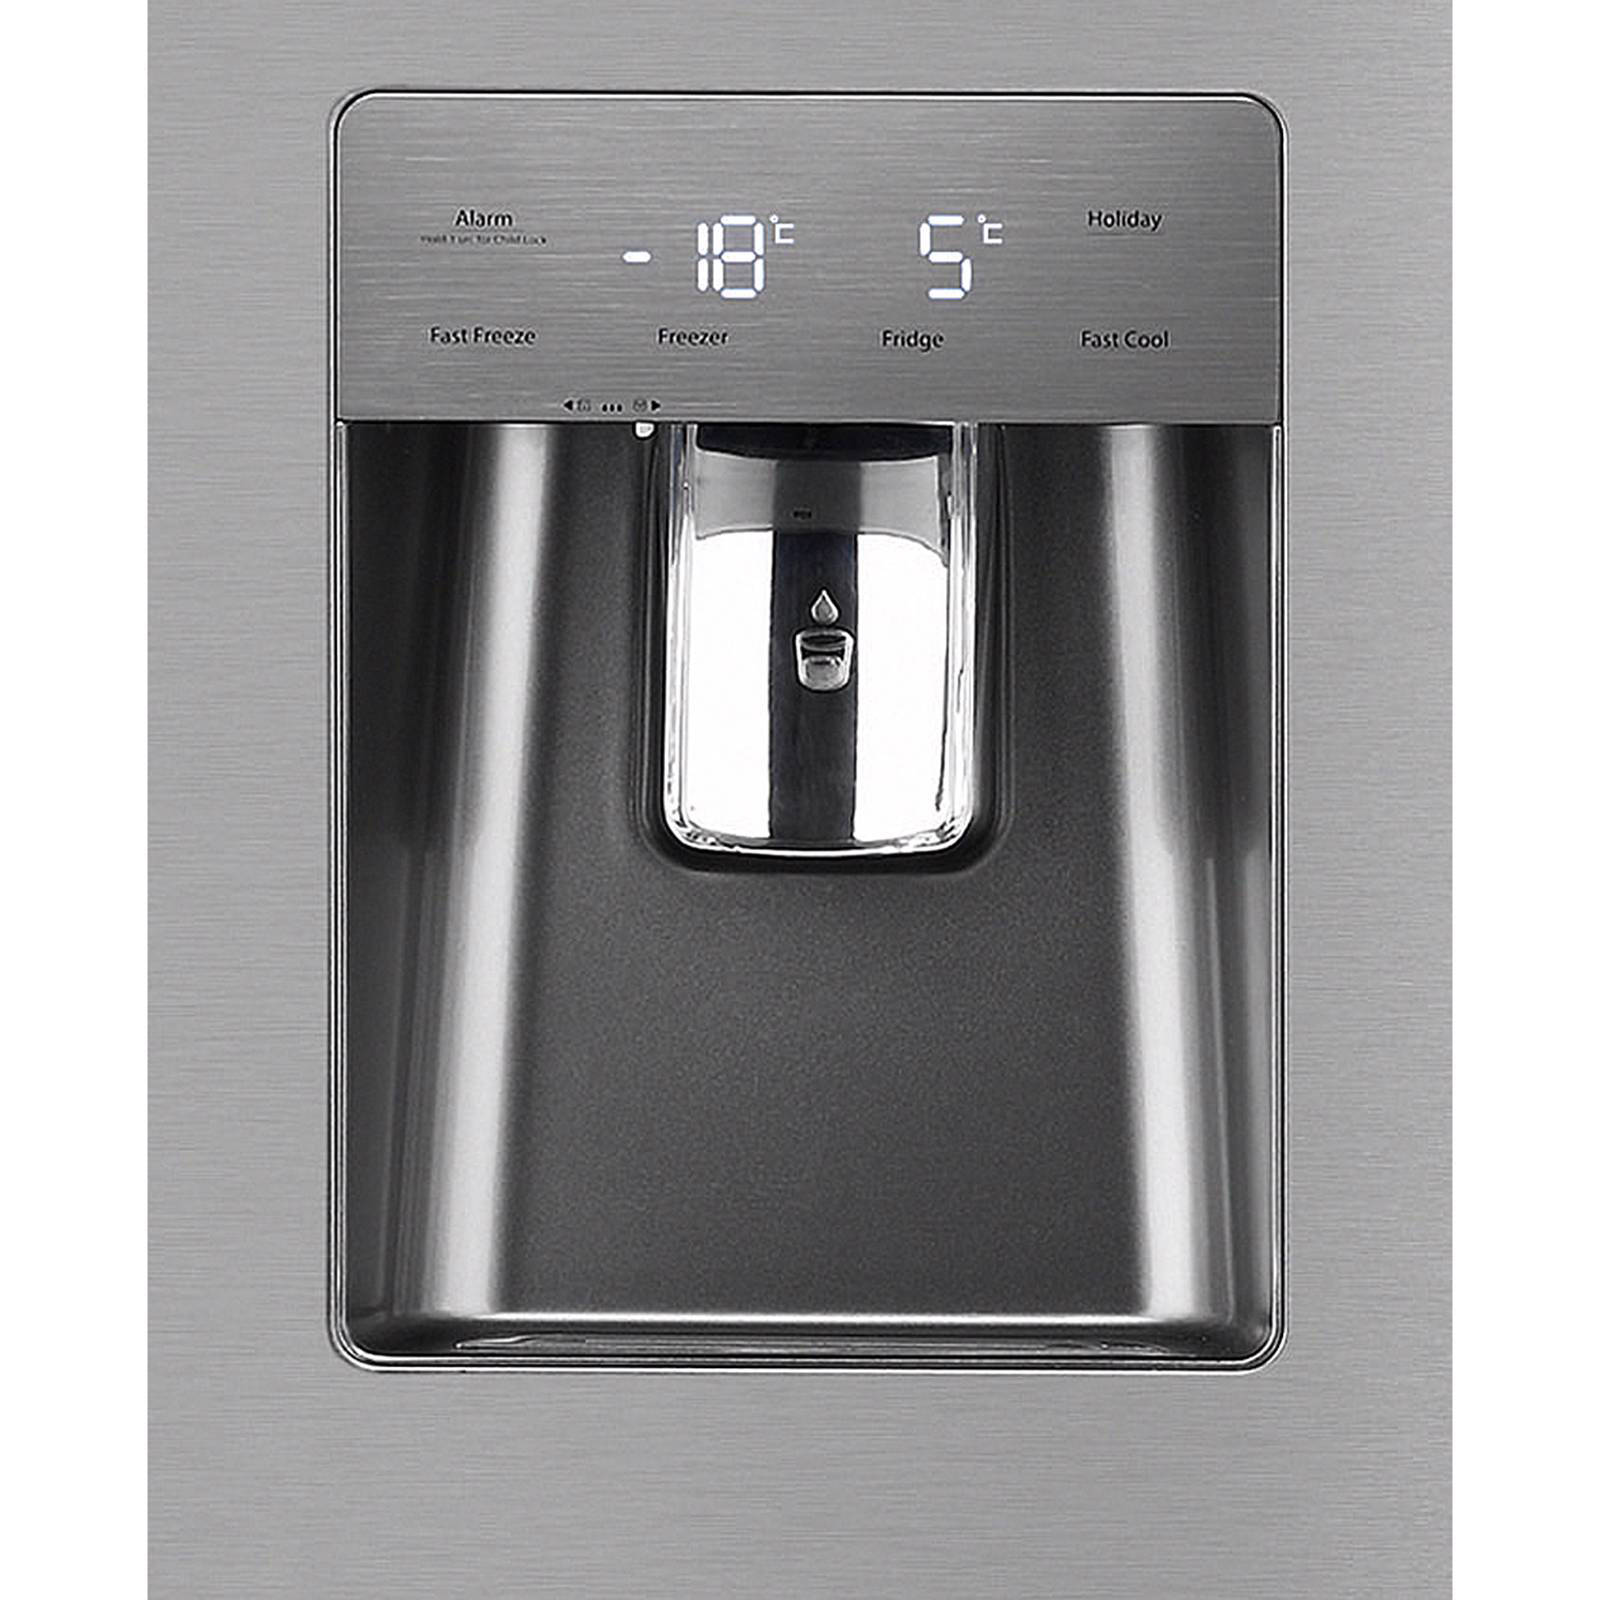 Verrassend AEG RMB86321NX Amerikaanse koelkast   wehkamp IP-81